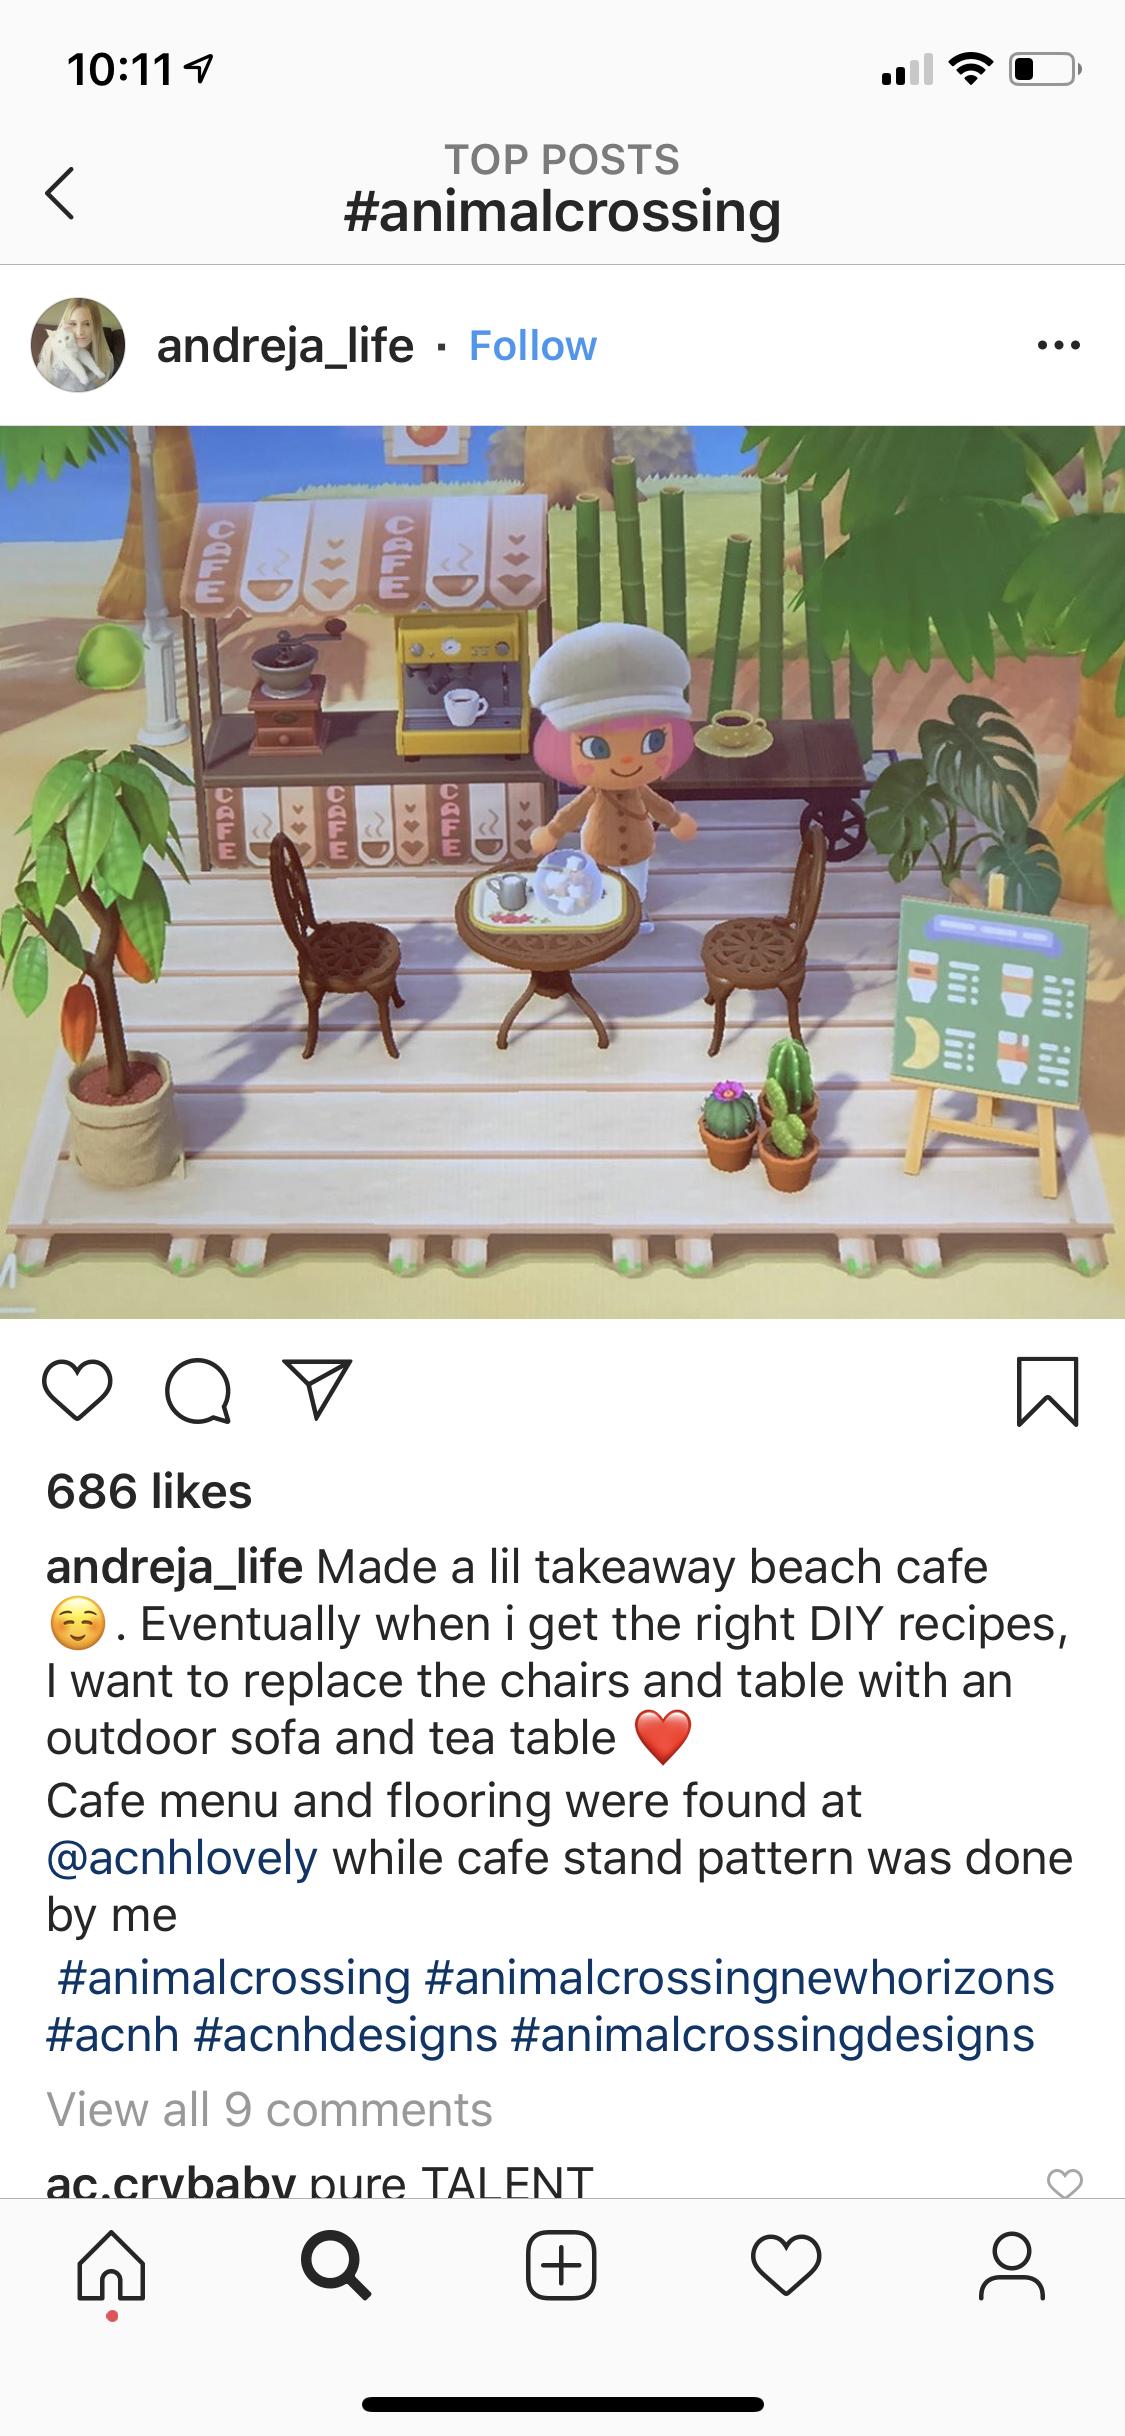 Take Away Beach Cafe By Andreja Life Animal Crossing Cafe Animal Crossing Animal Crossing Game